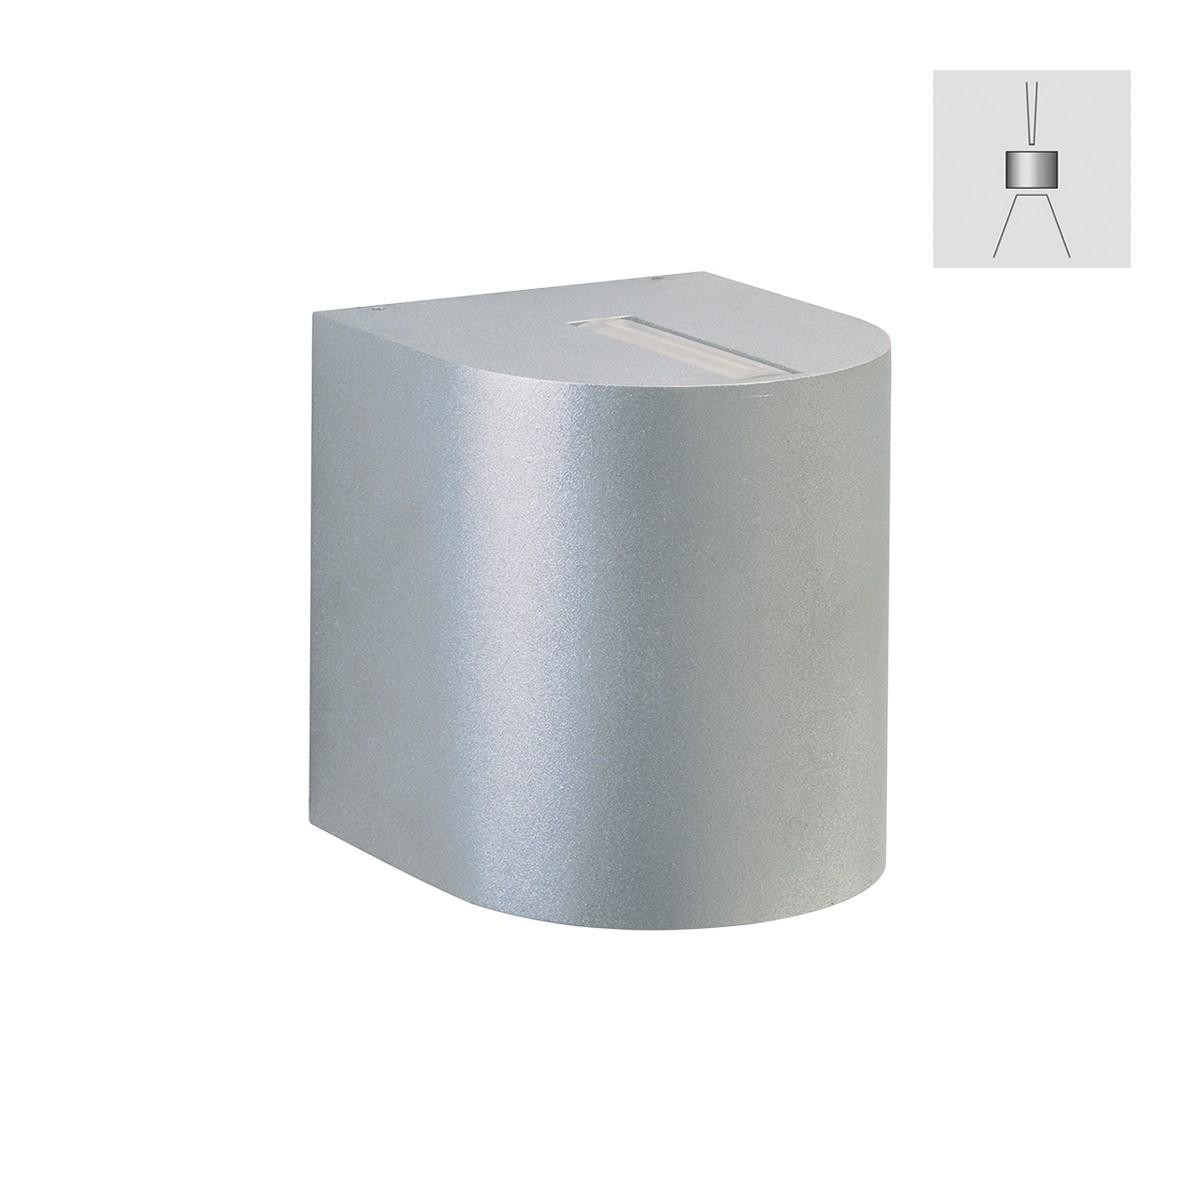 Albert 2401 Wandstrahler, eng/breit, Silber